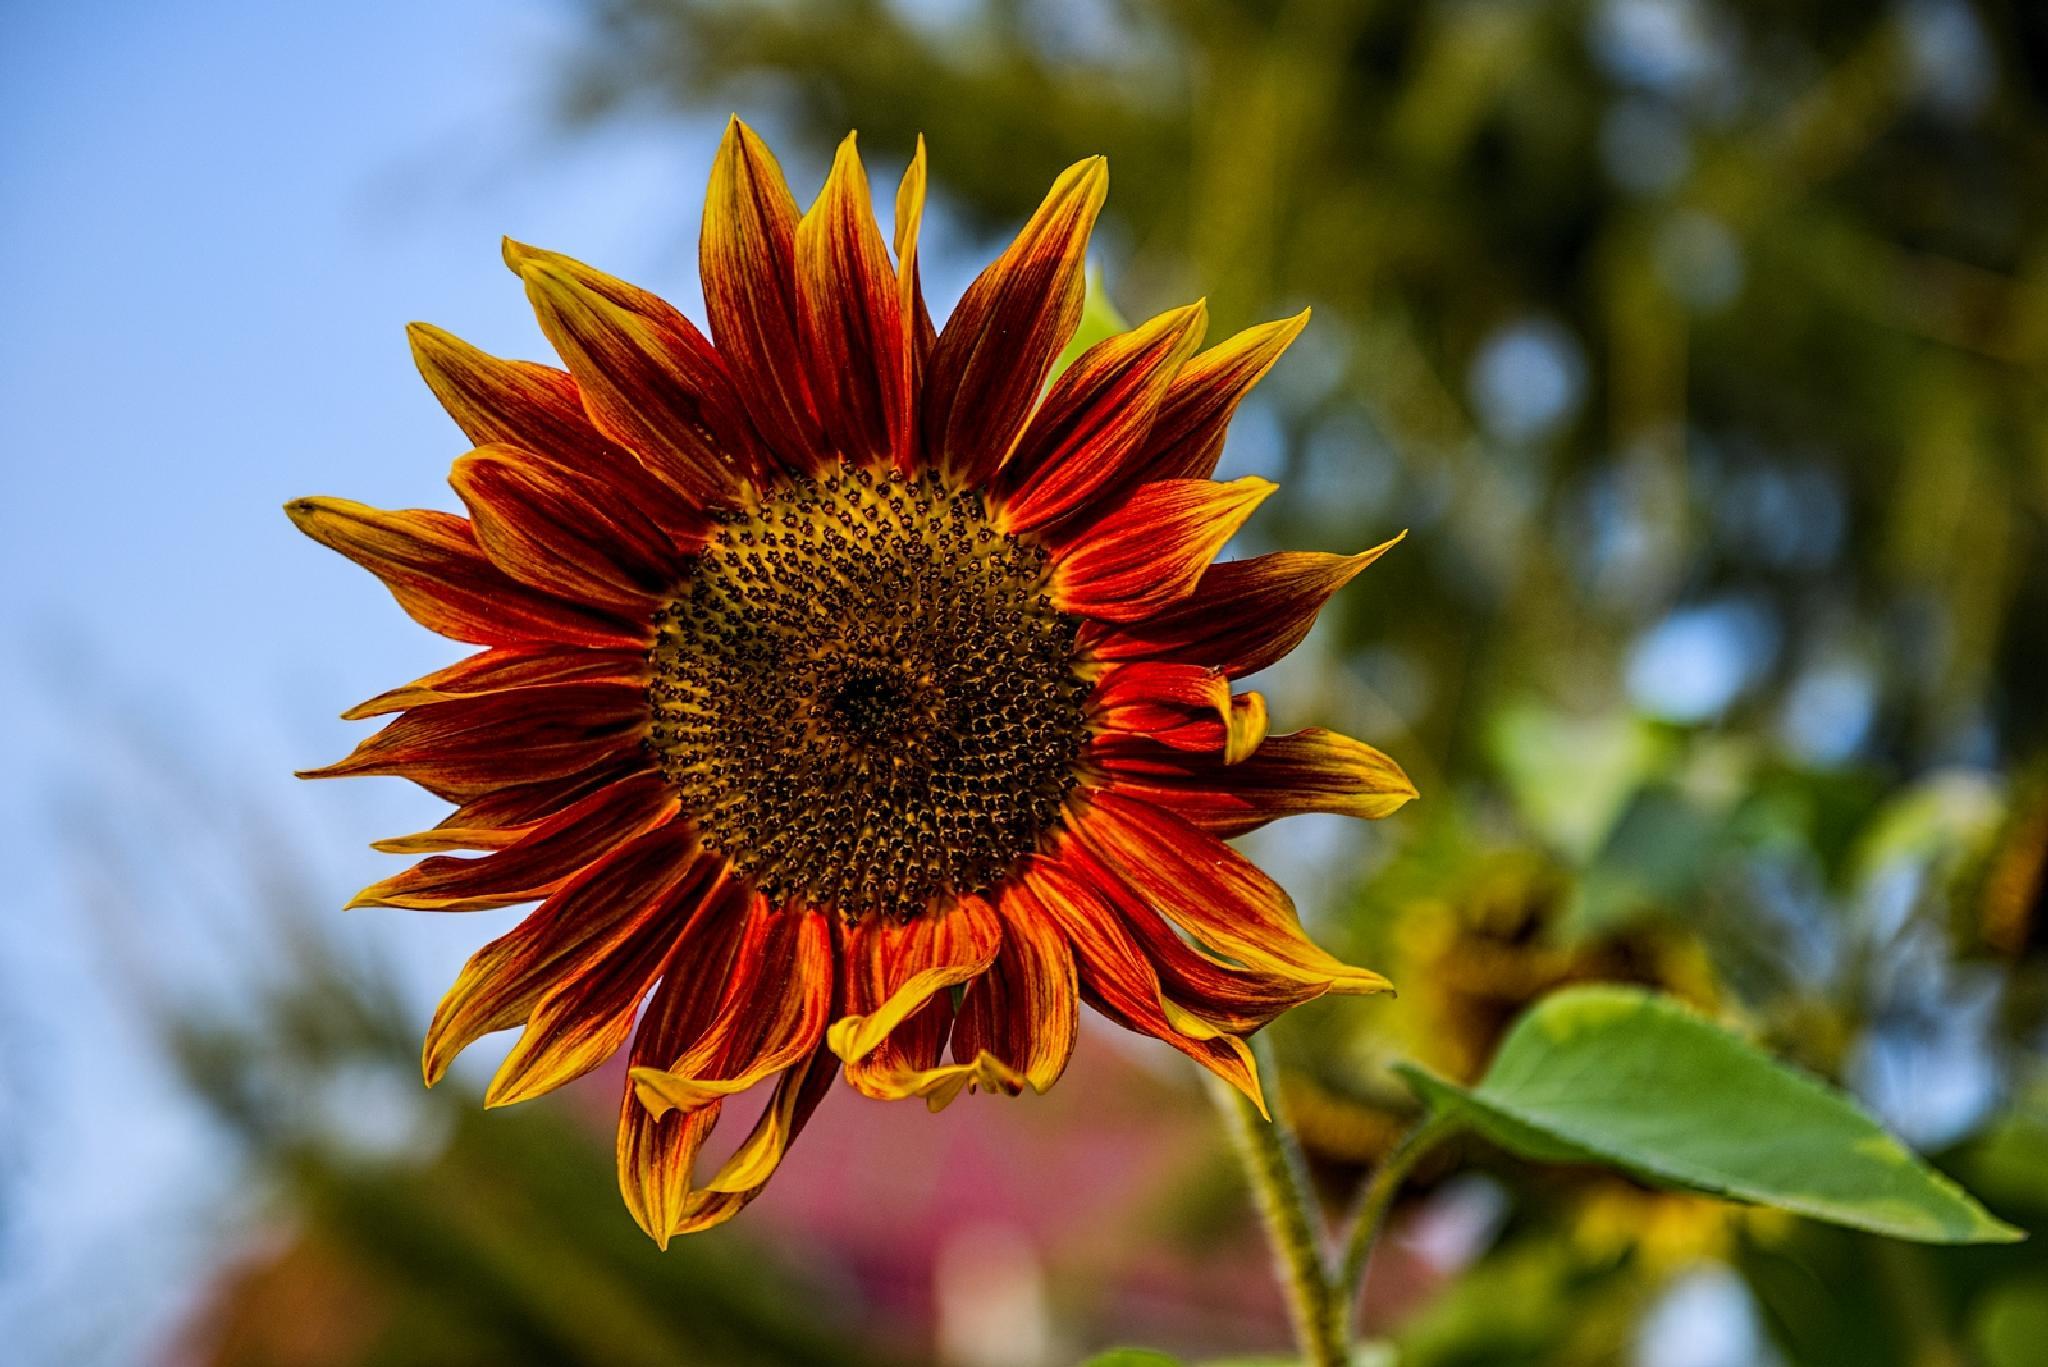 Colorful sunflower by Waldemar Sadlowski